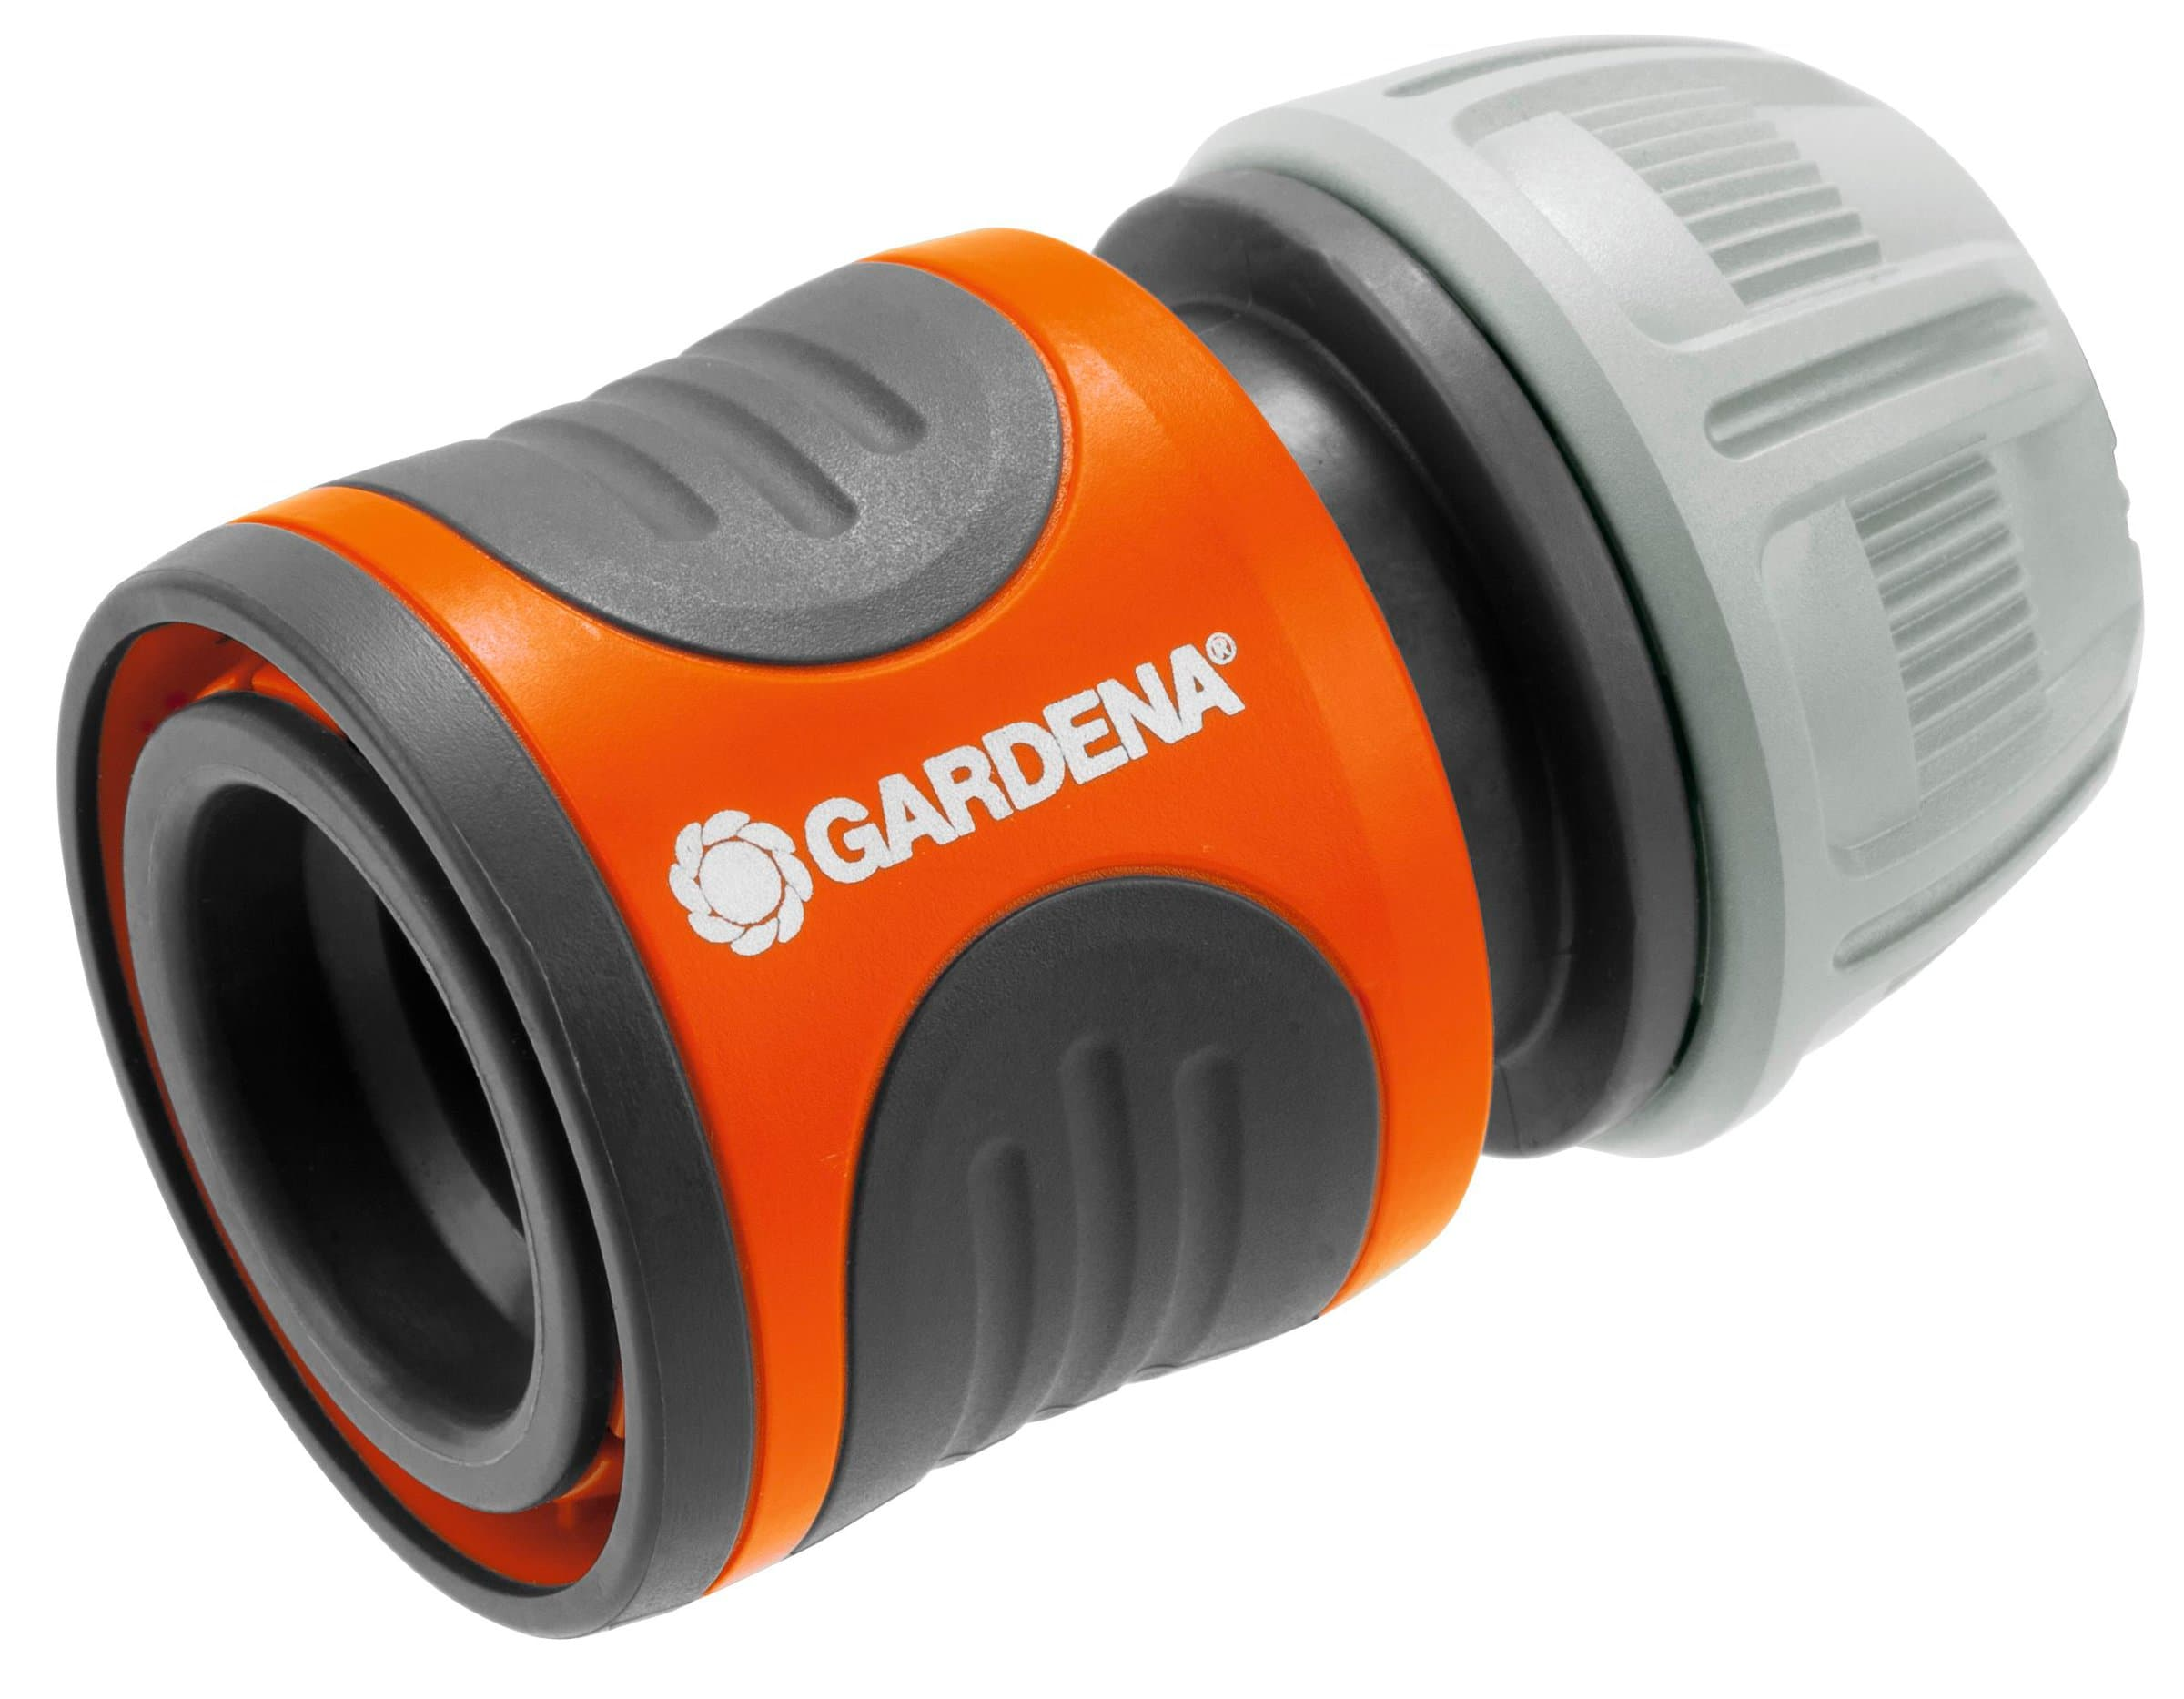 Gardena Original GARDENA System Raccord rapide